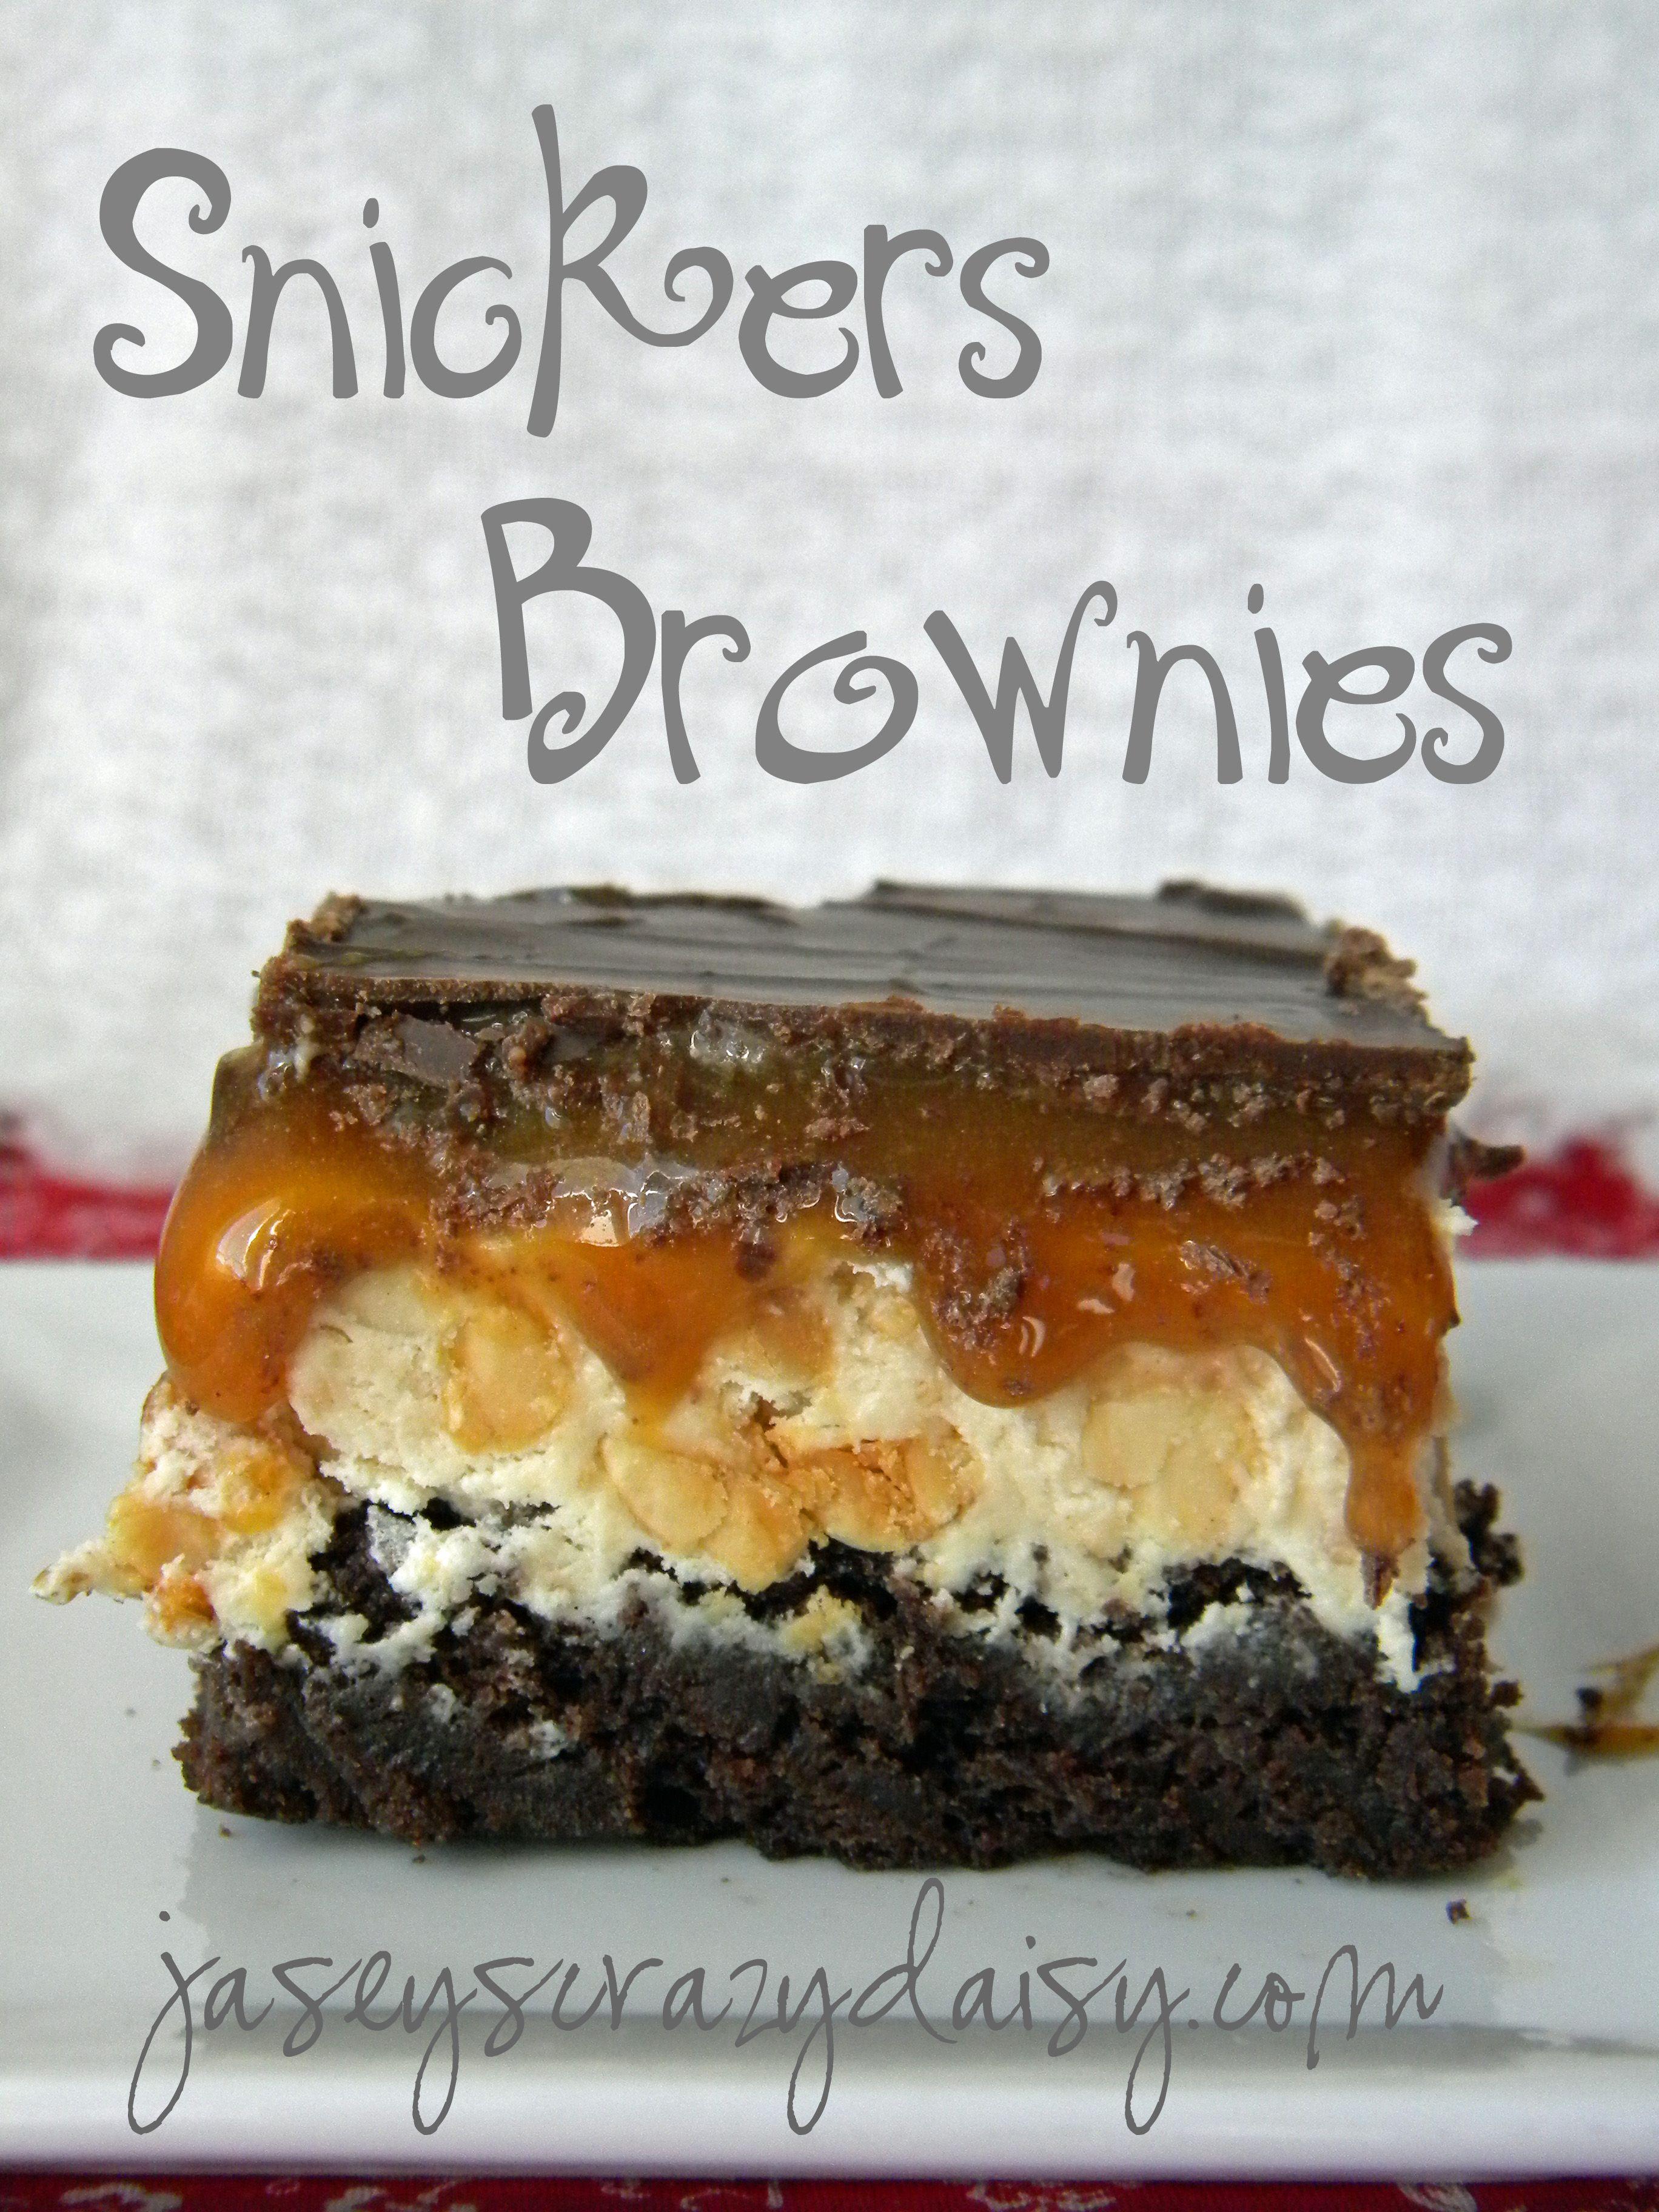 Snickers Brownies--Yumm!